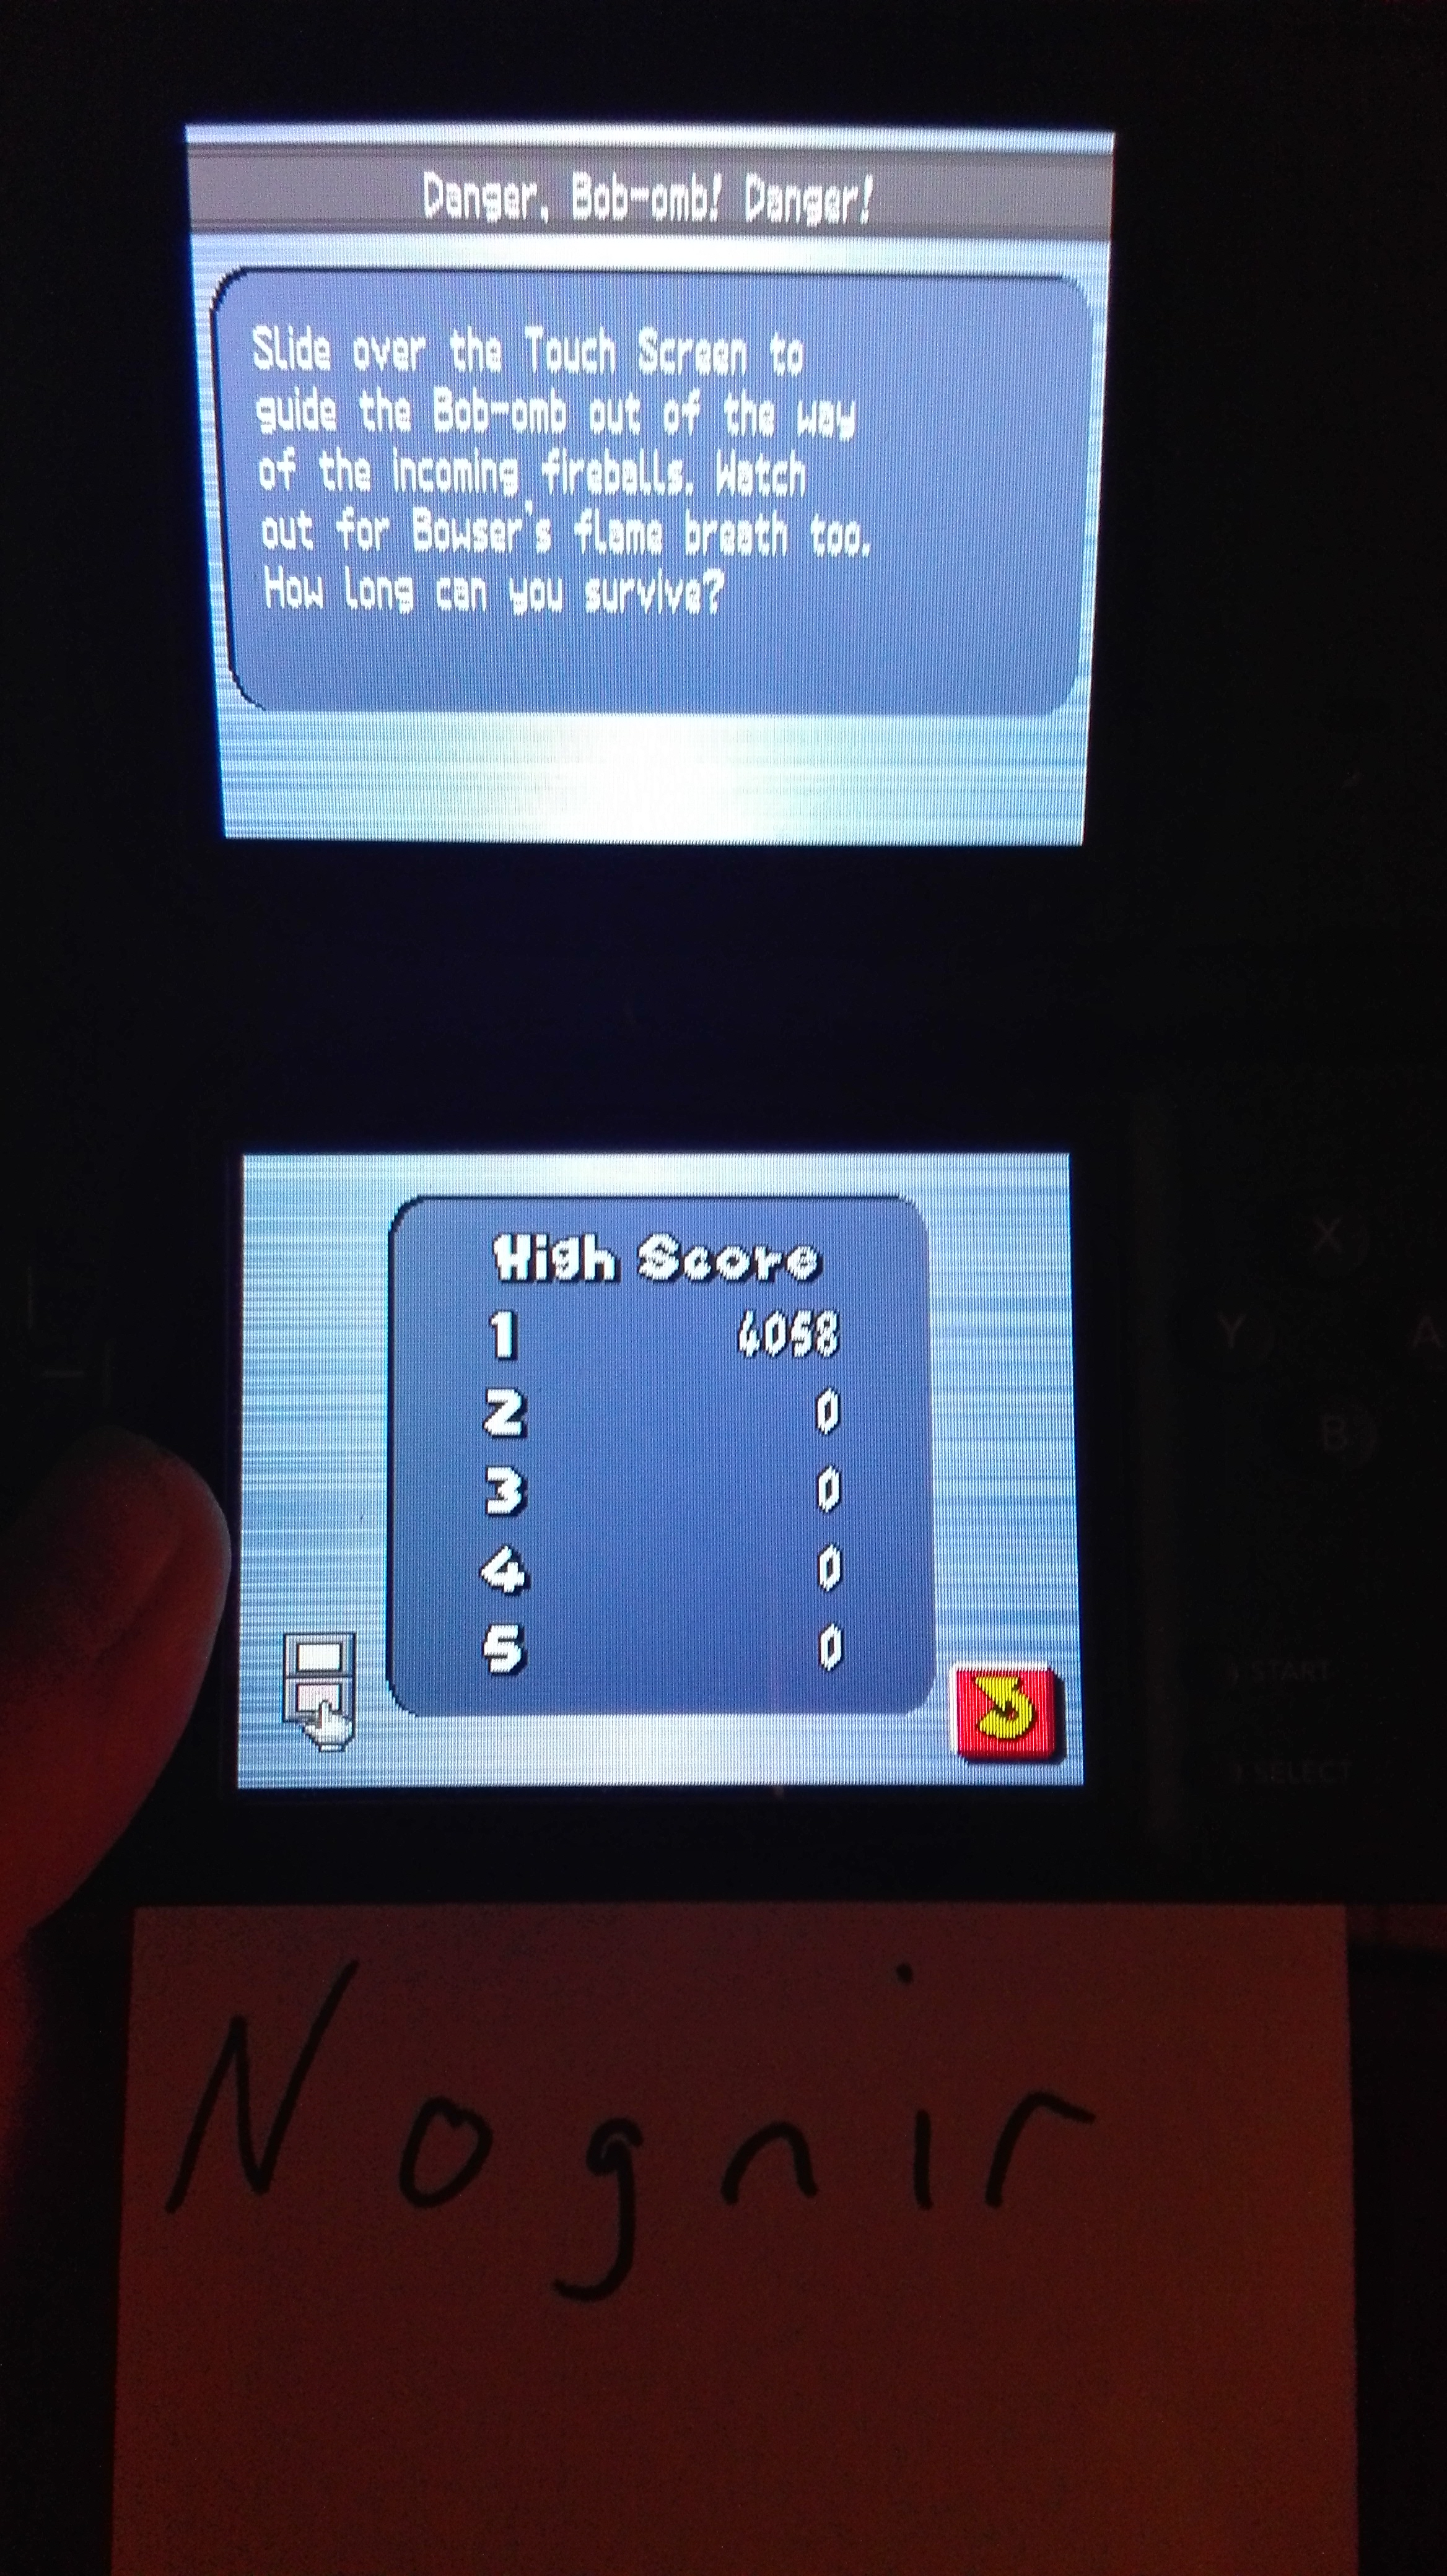 New Super Mario Bros.: Danger, Bob-omb! Danger! 4,058 points